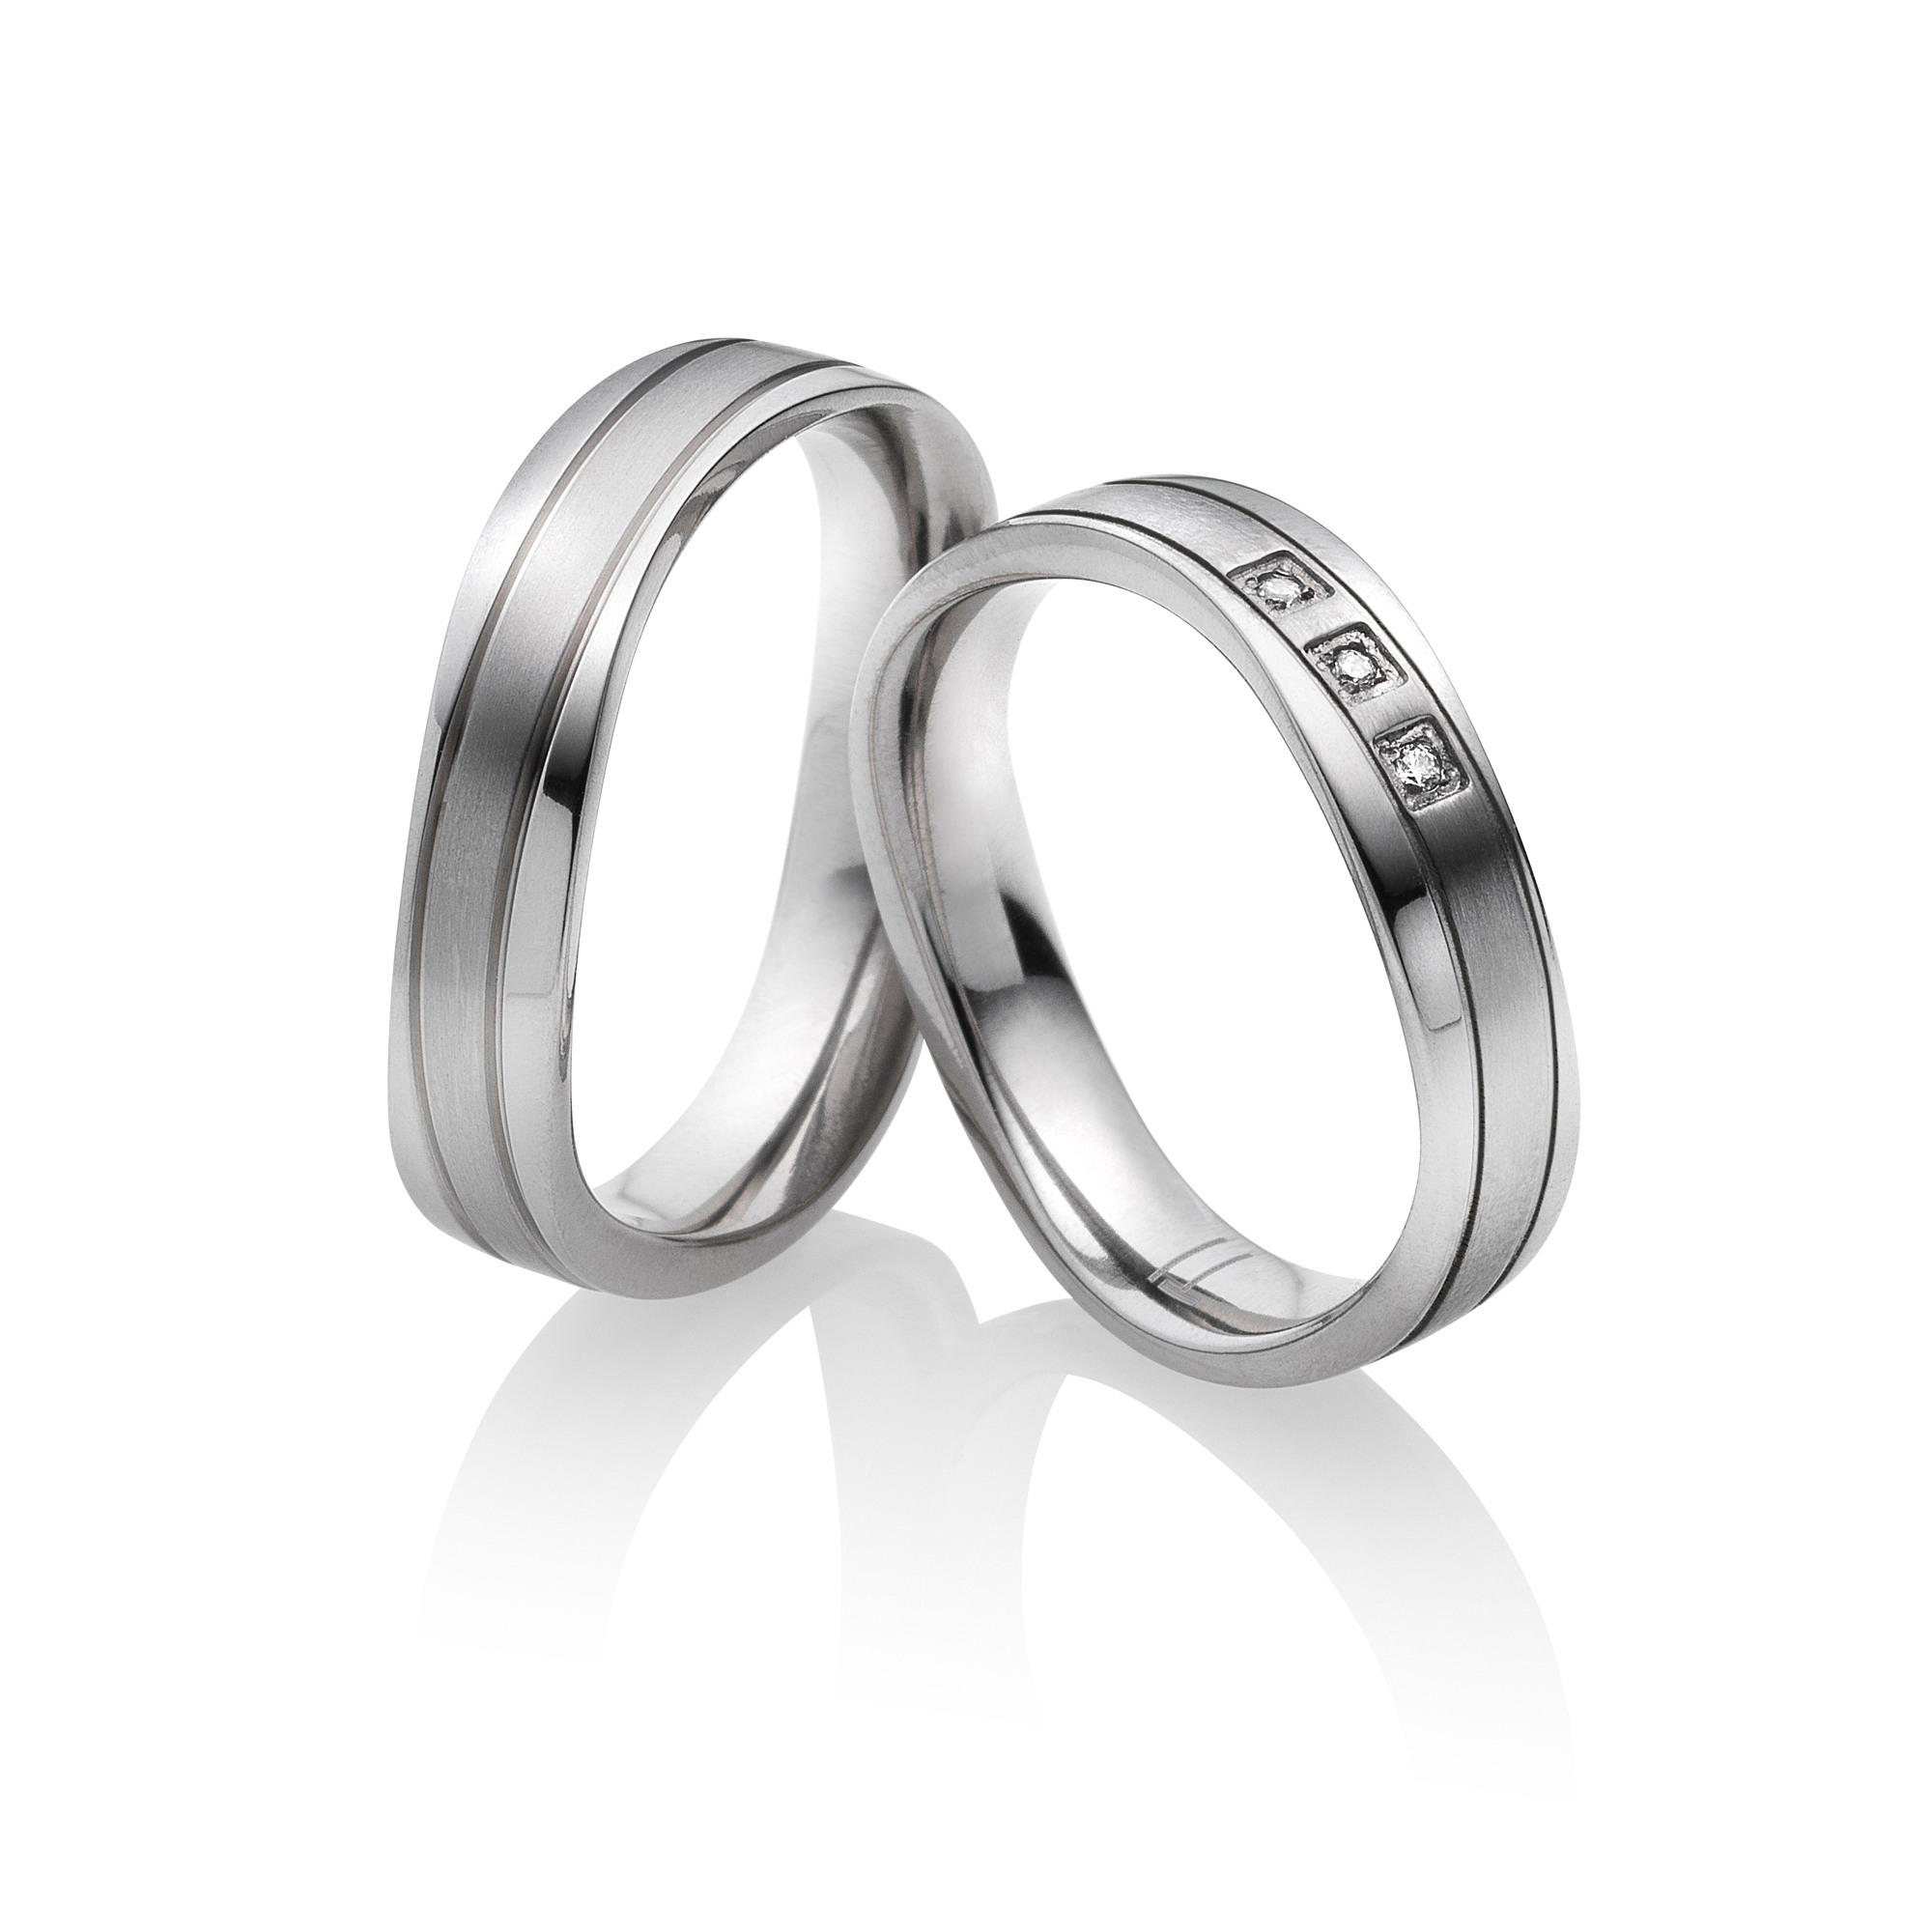 Titan Eheringe Partnerringe Adria | Miomi - Tungsten Carbide Jewelry